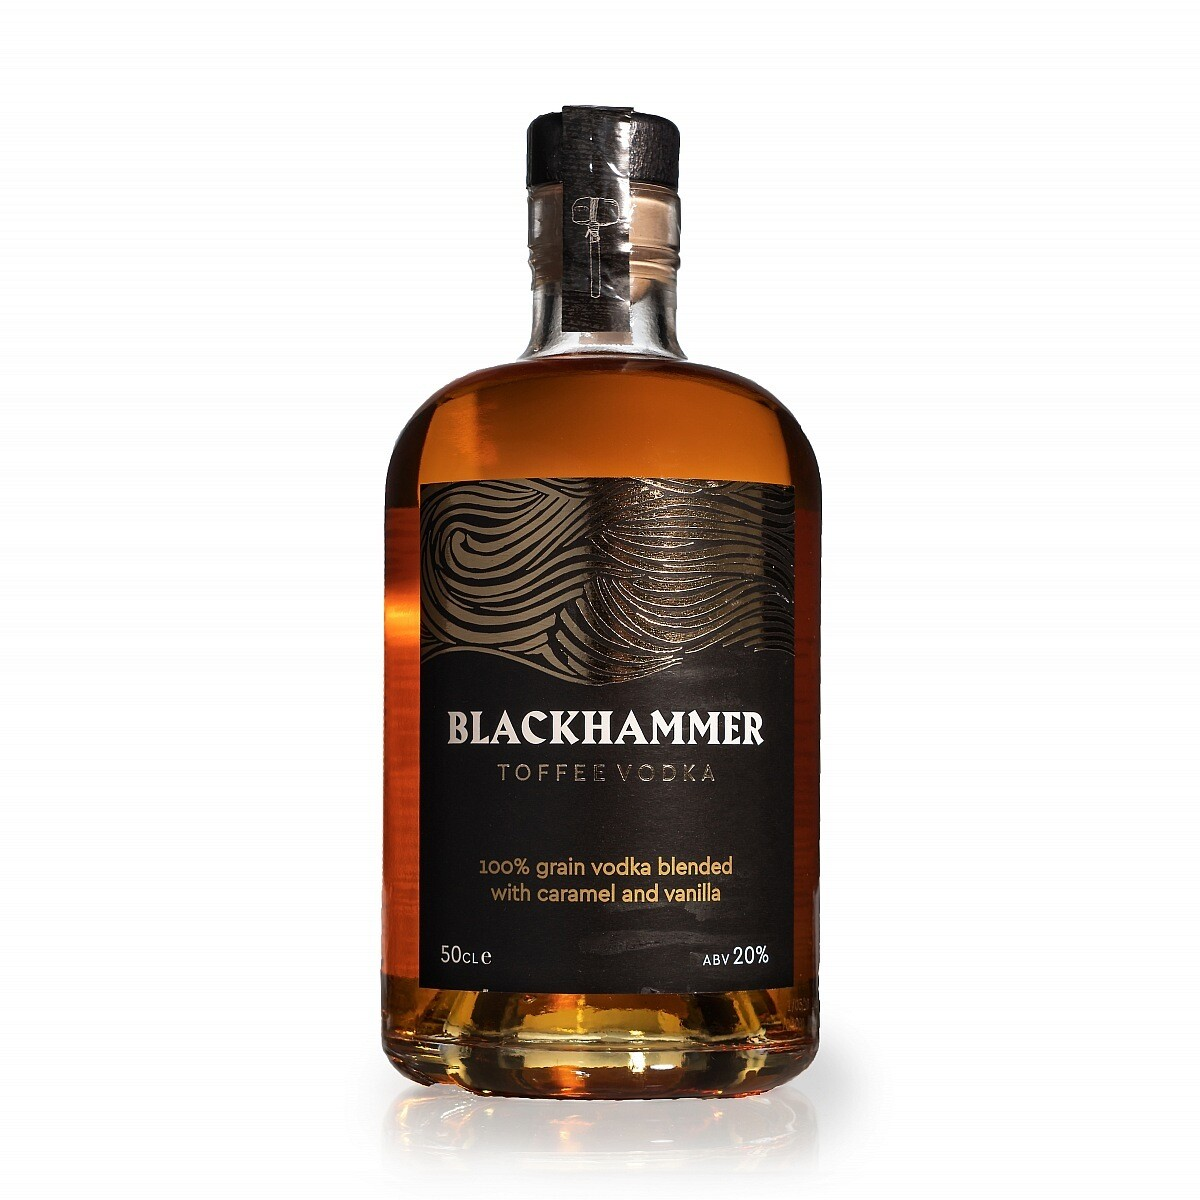 Blackhammer Toffee Vodka 50cl